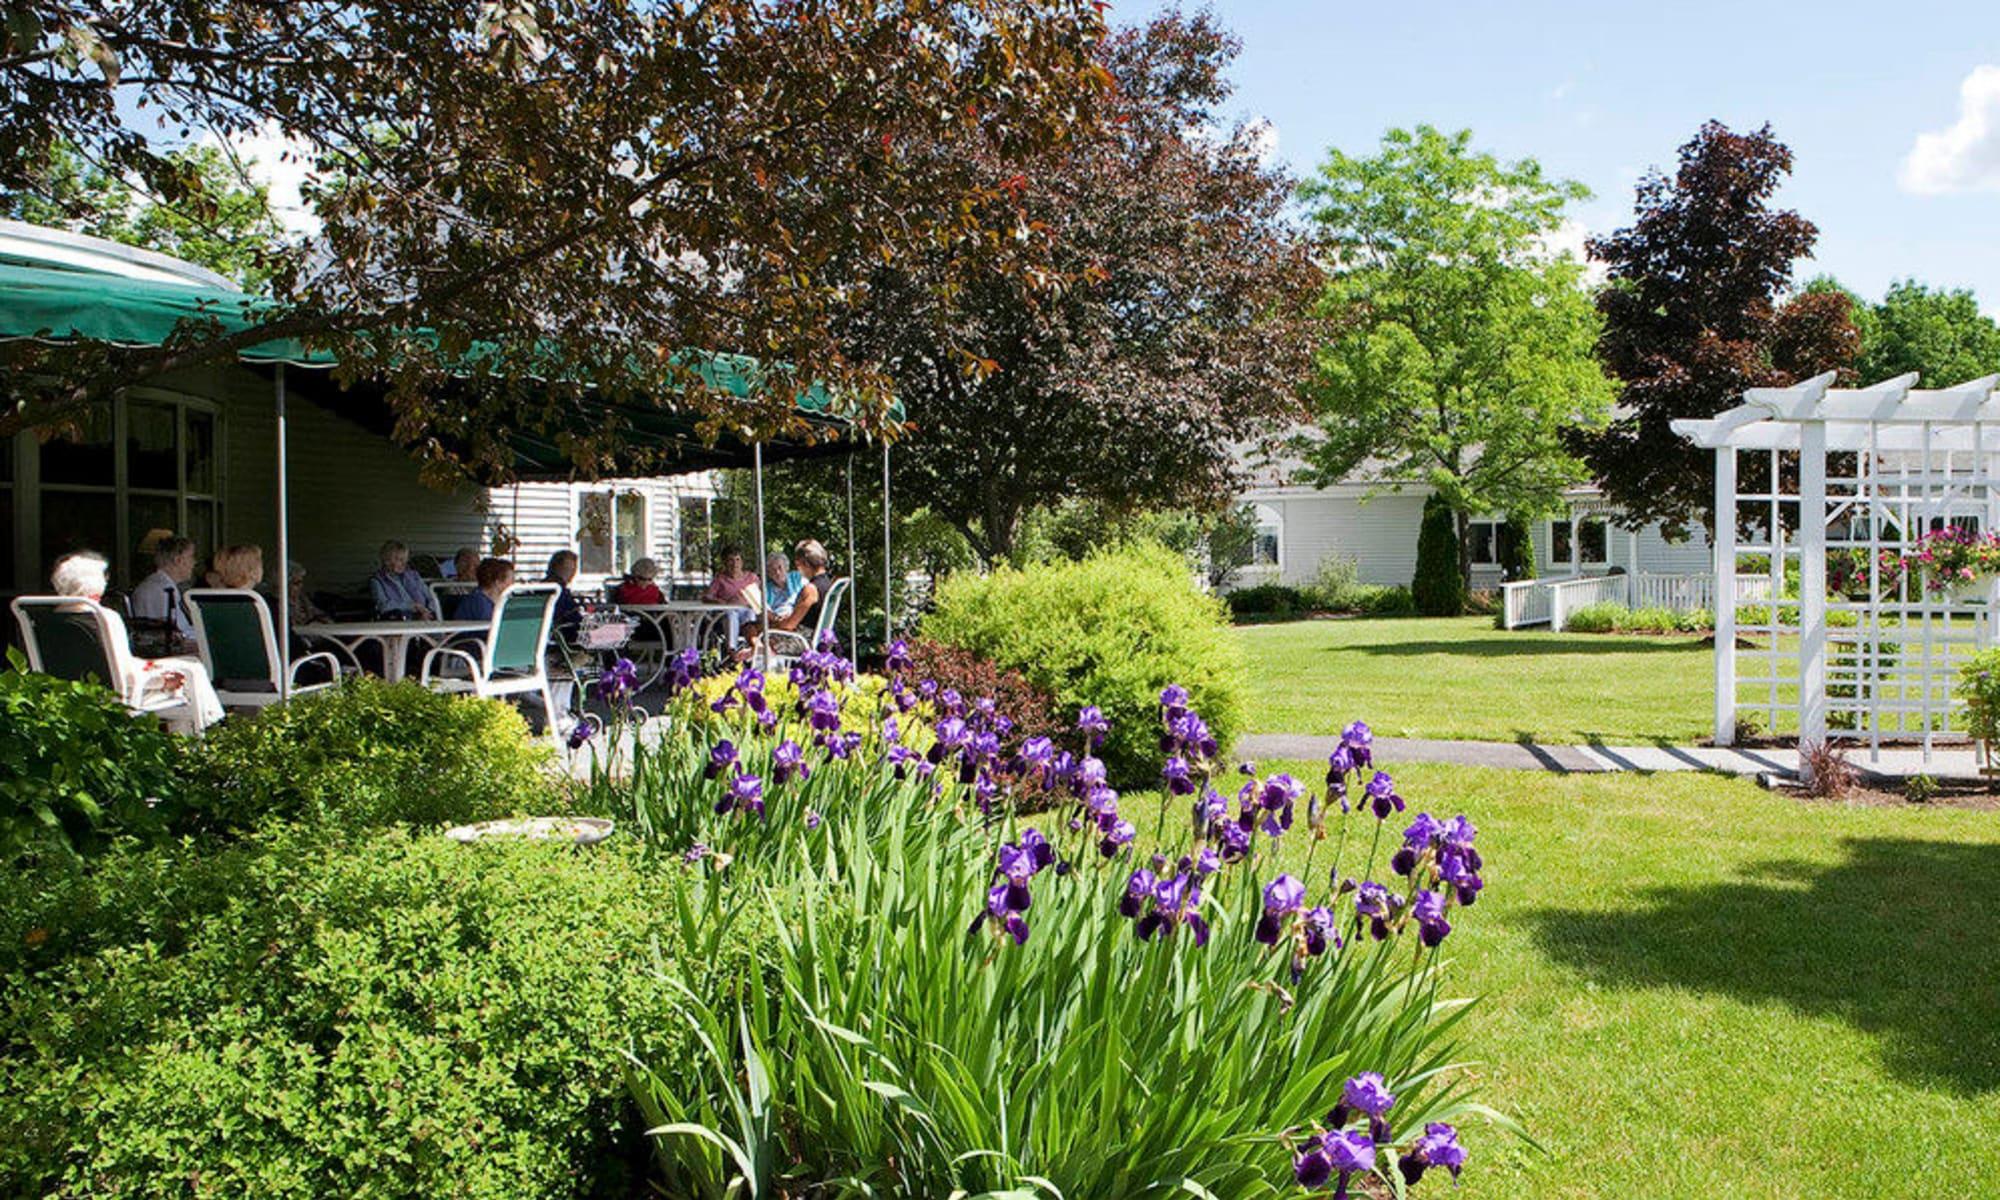 Senior living at Equinox Terrace in Manchester Center, Vermont